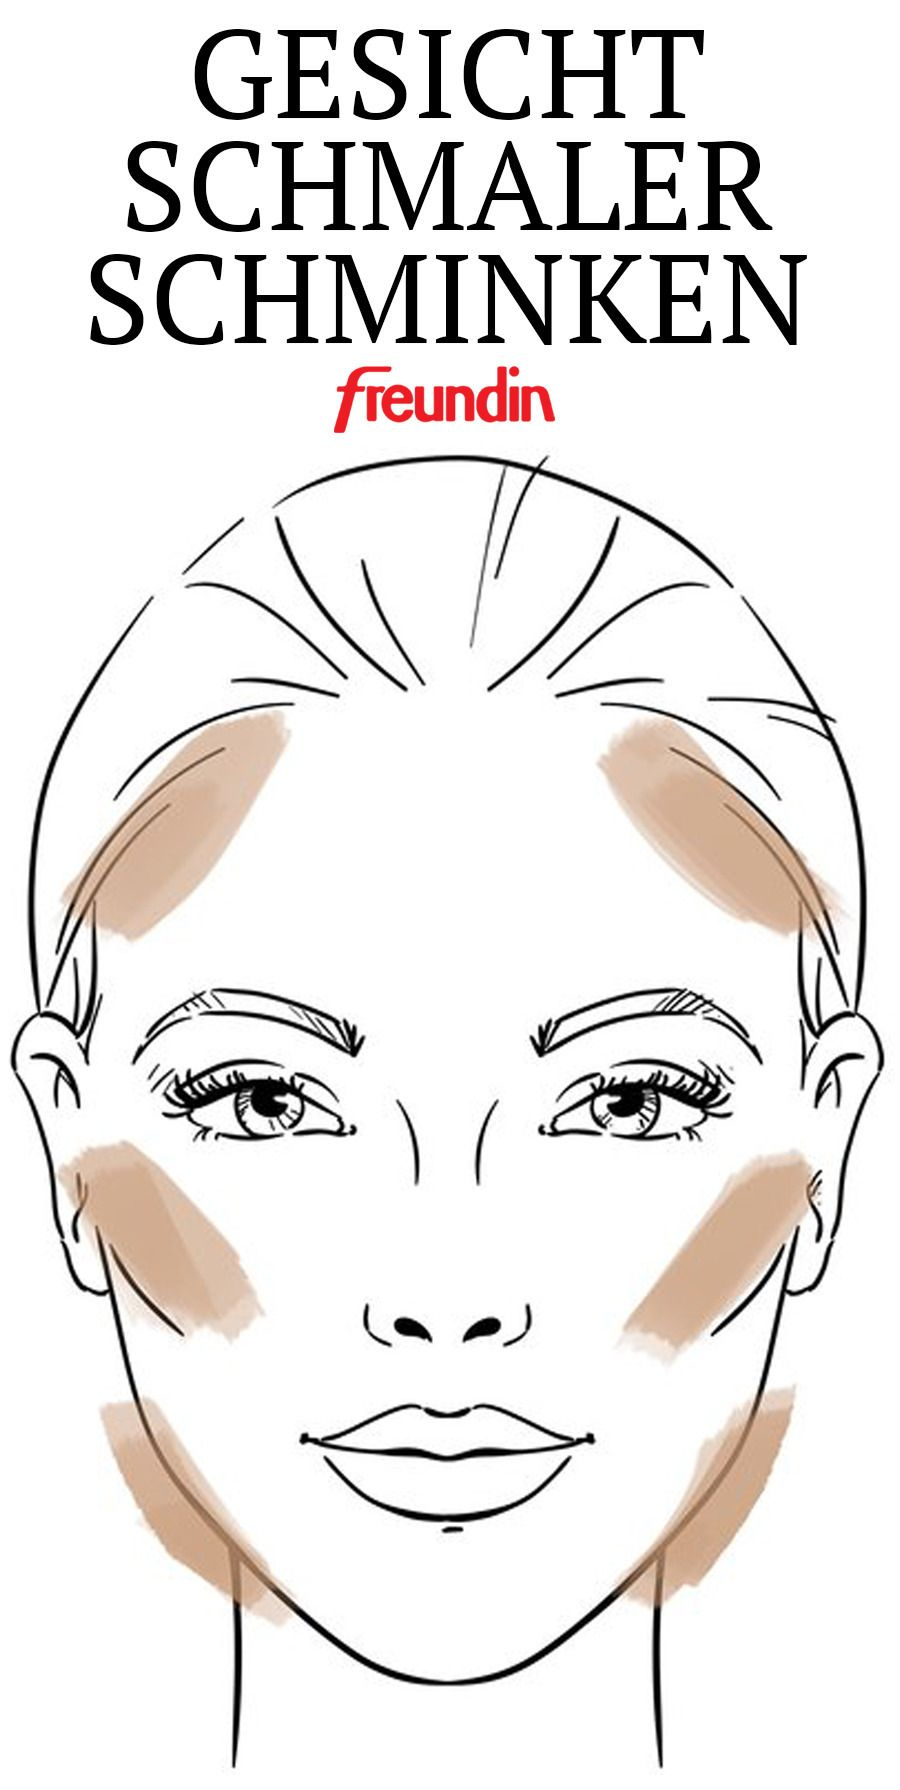 Wie schminke ich mein Gesicht schmaler? | freundin.de #contouringmakeup